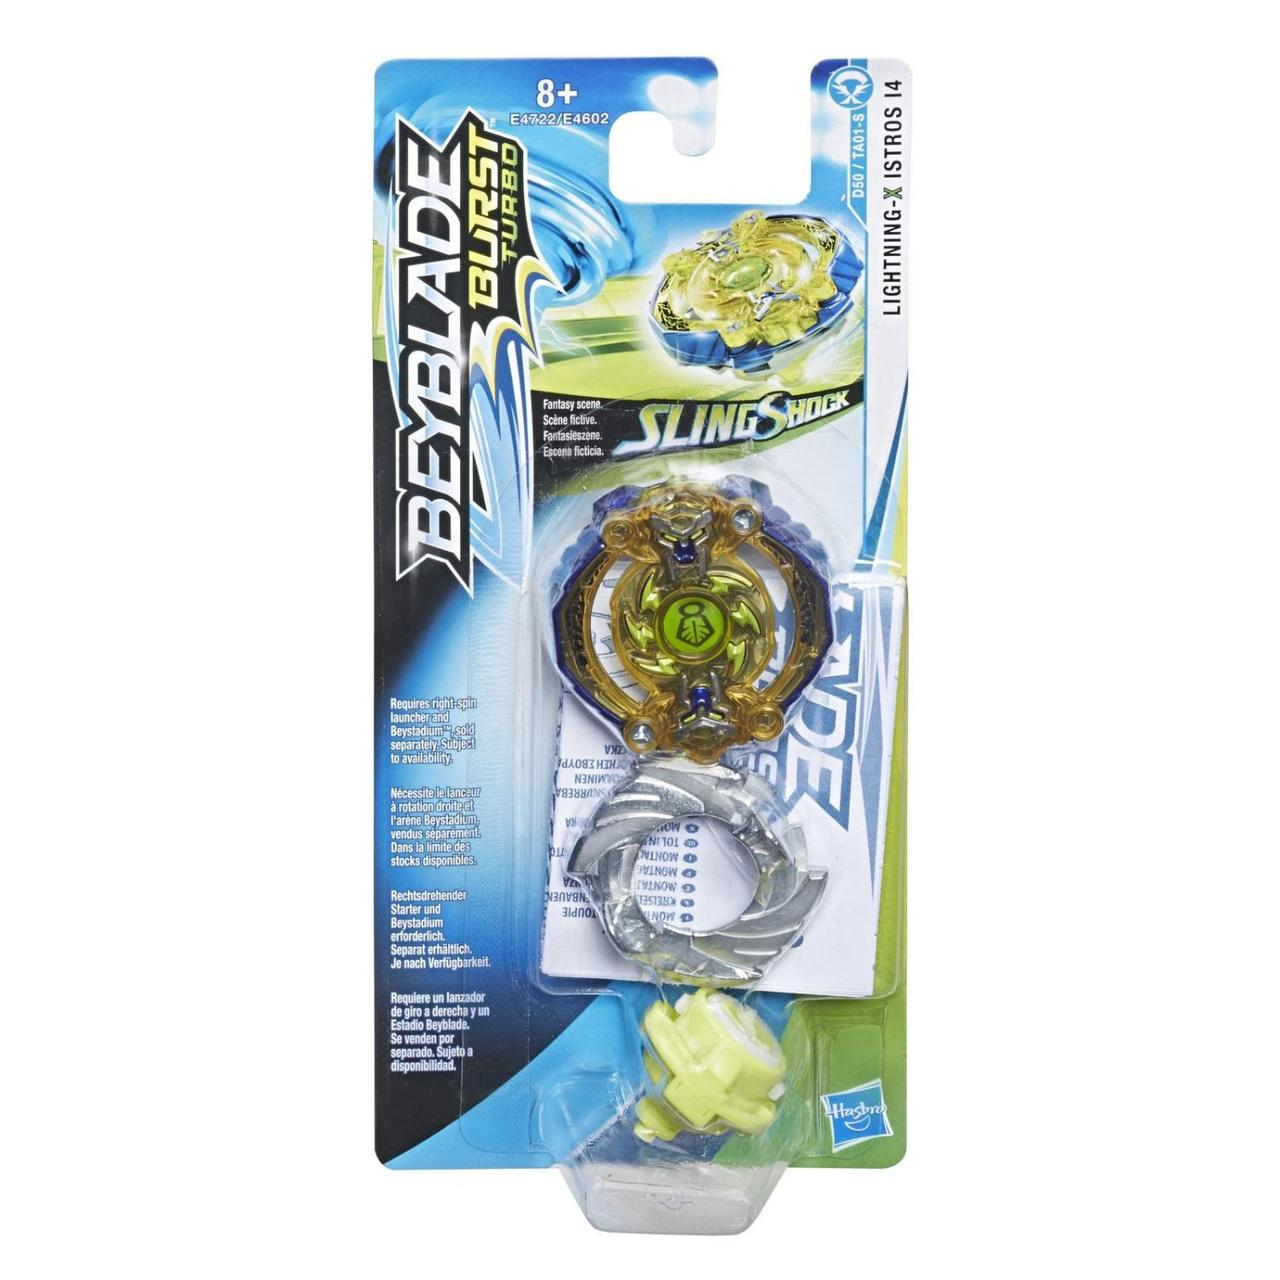 Hasbro Bey Blade СлингШок Волчок Бейблэйд Lightning-X Istros L4 D50 / TA01-S